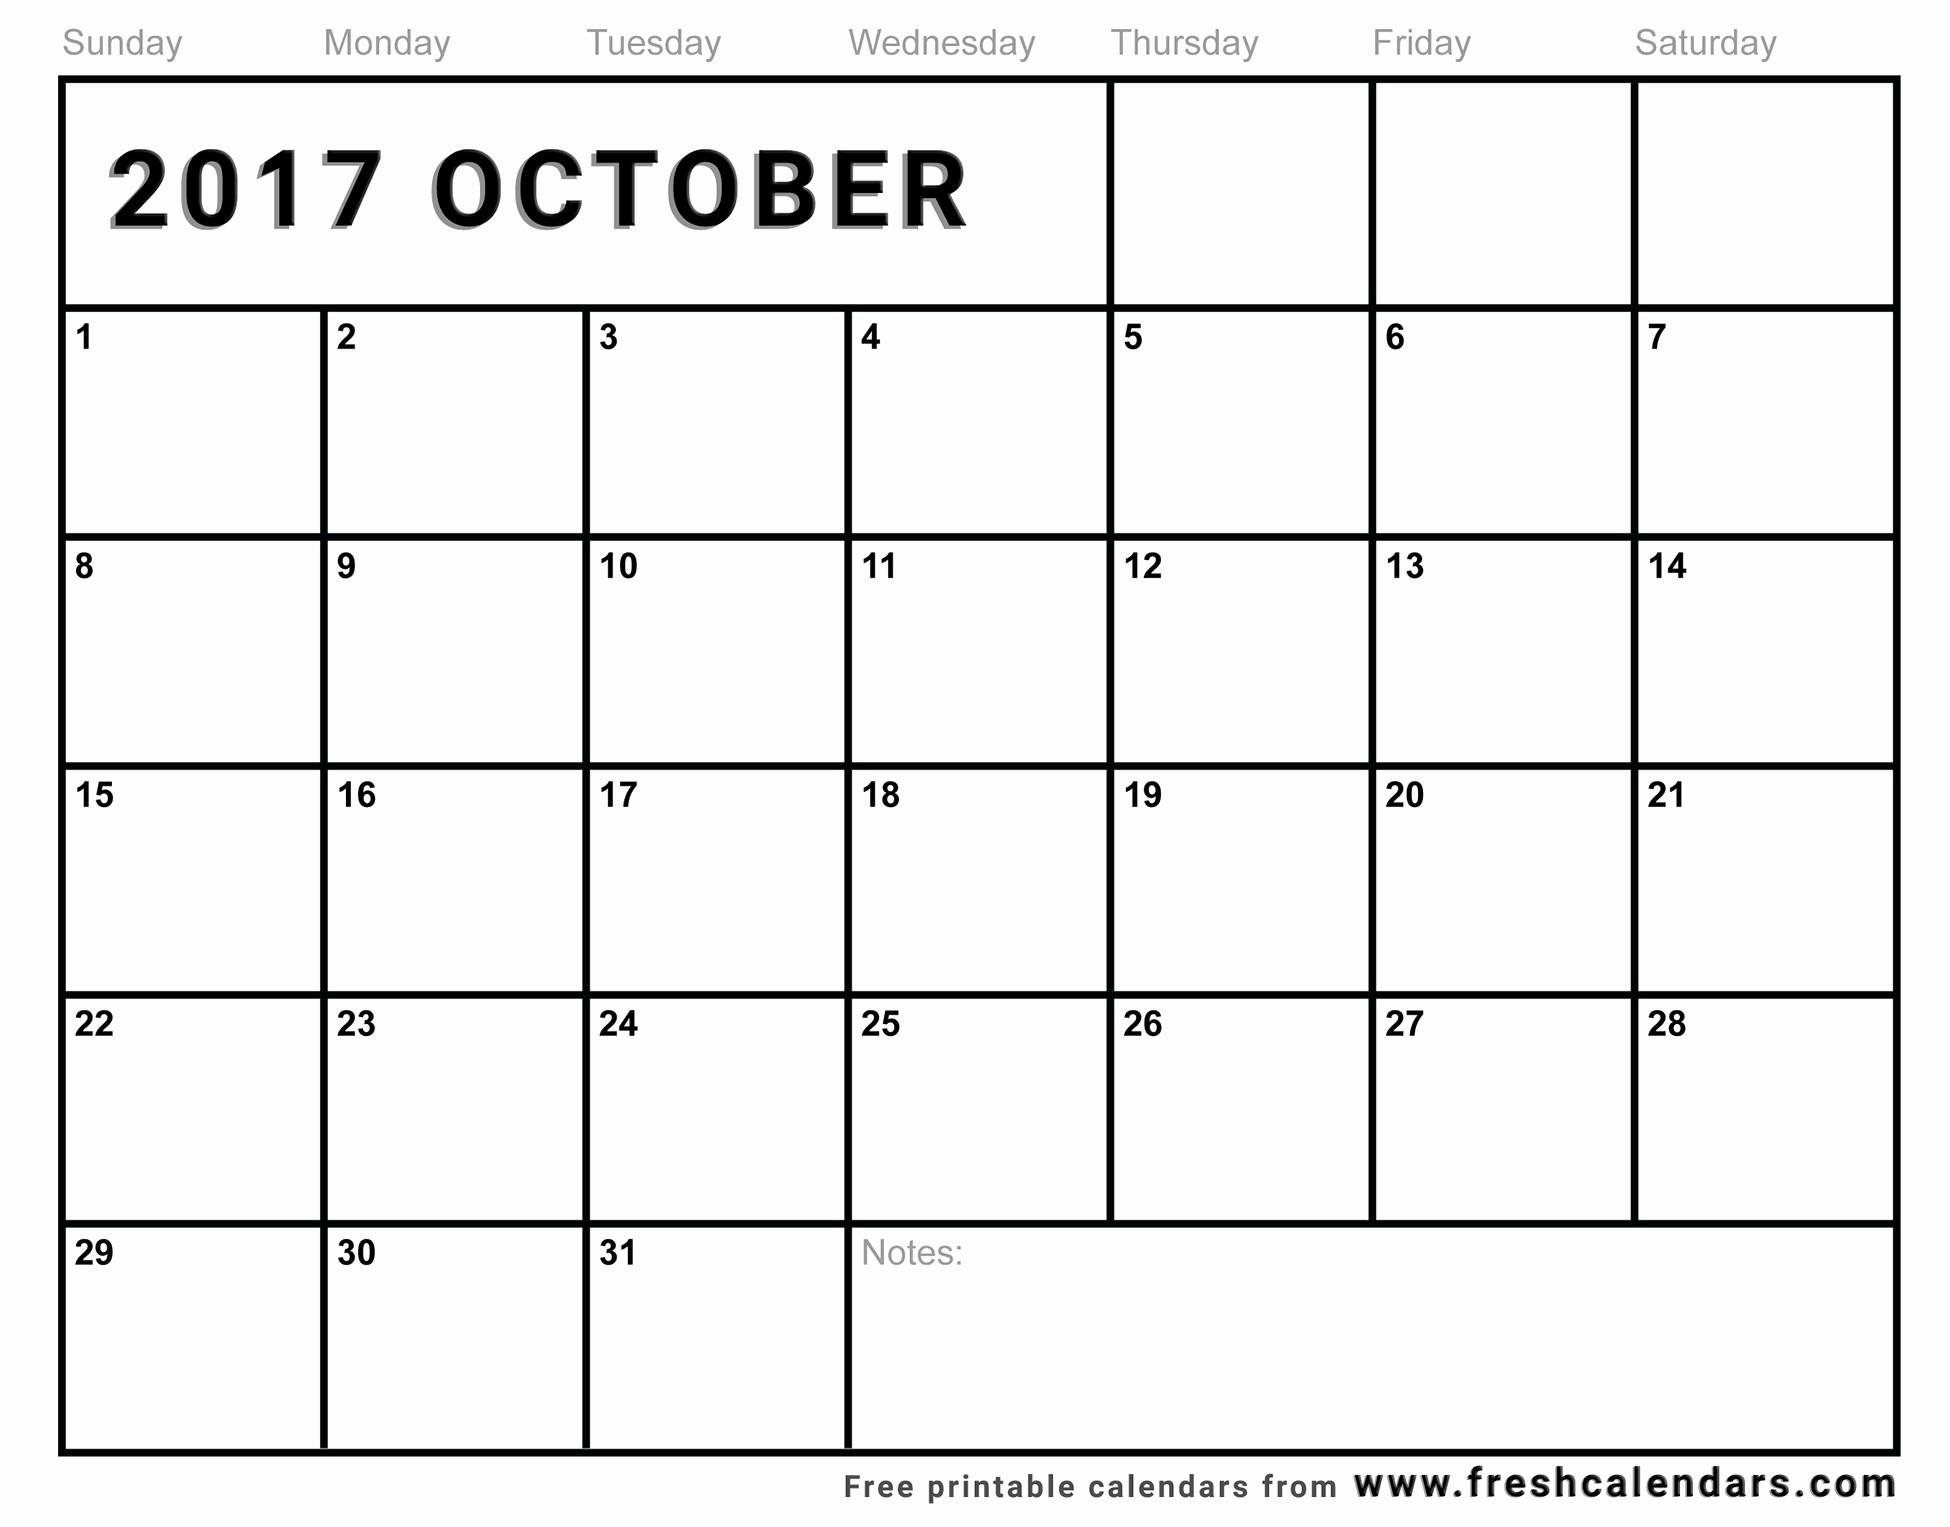 Free Printable Weekly Calendars 2017 Awesome Blank October 2017 Calendar Printable Templates